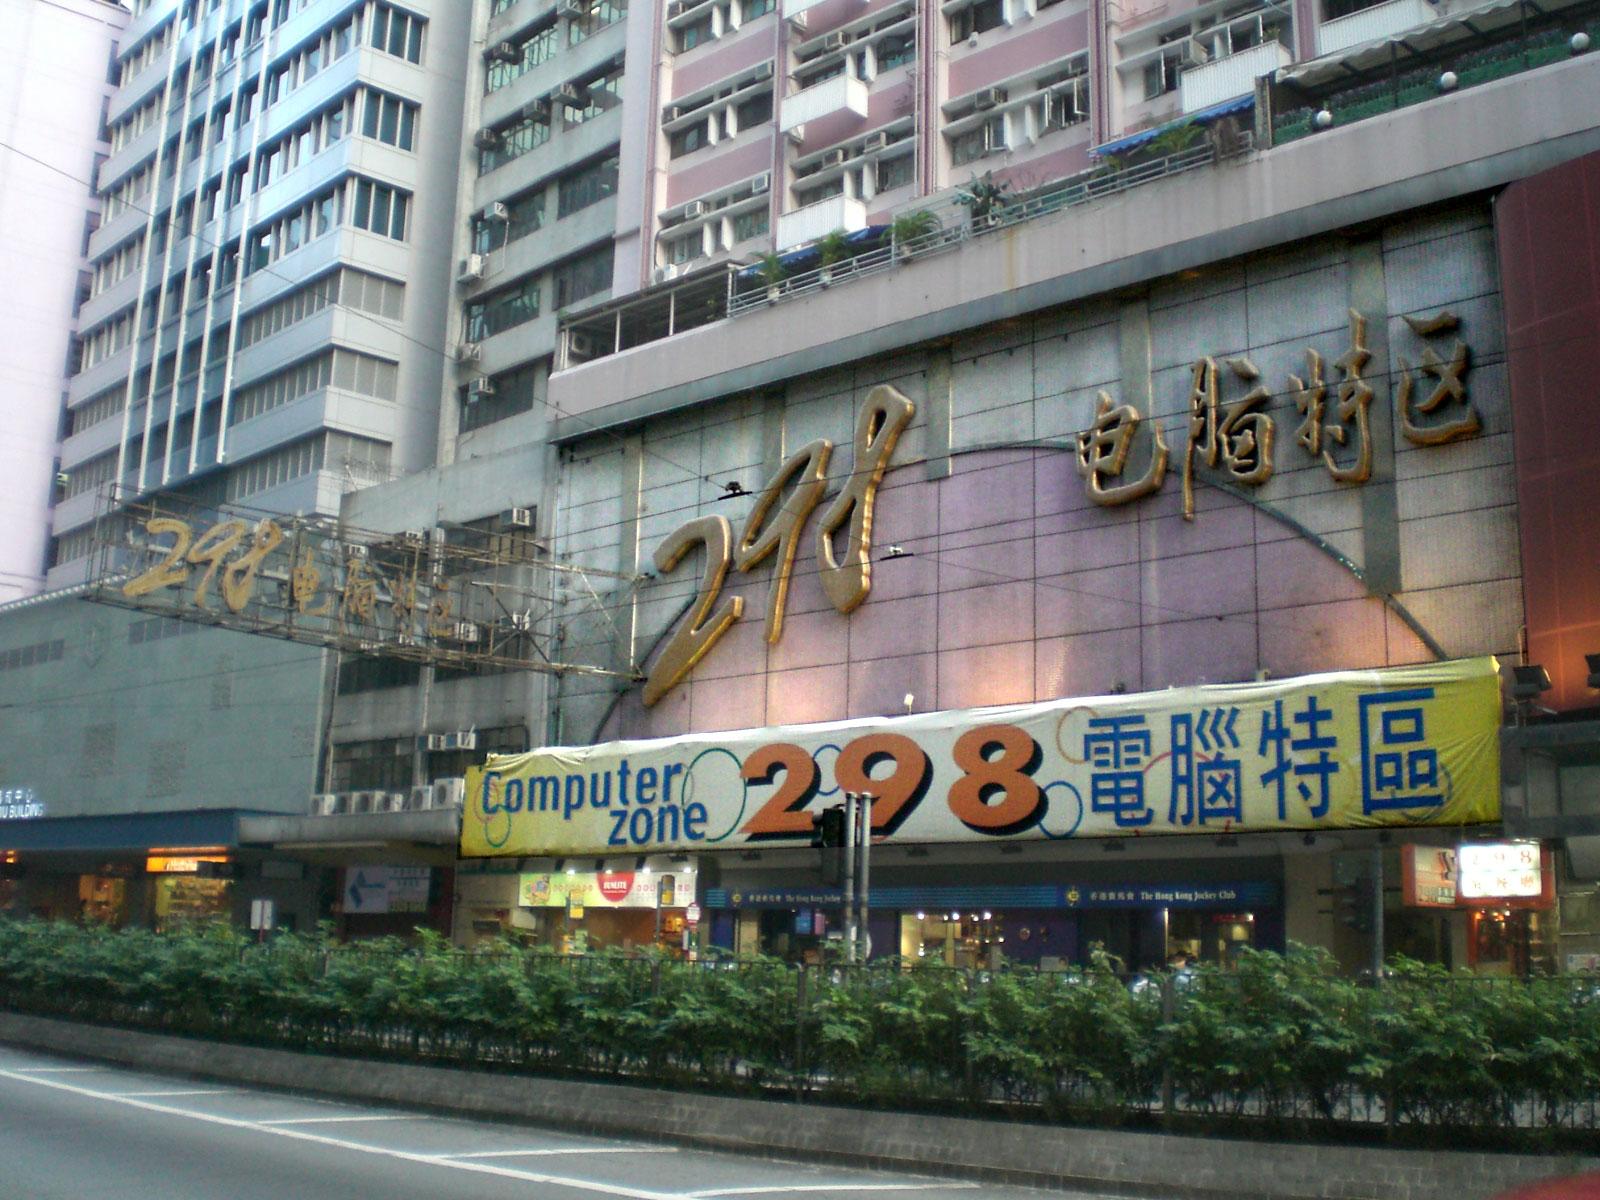 File:HK Wan Chai Hennessy Road 298 Computer Zone 1 a.jpg